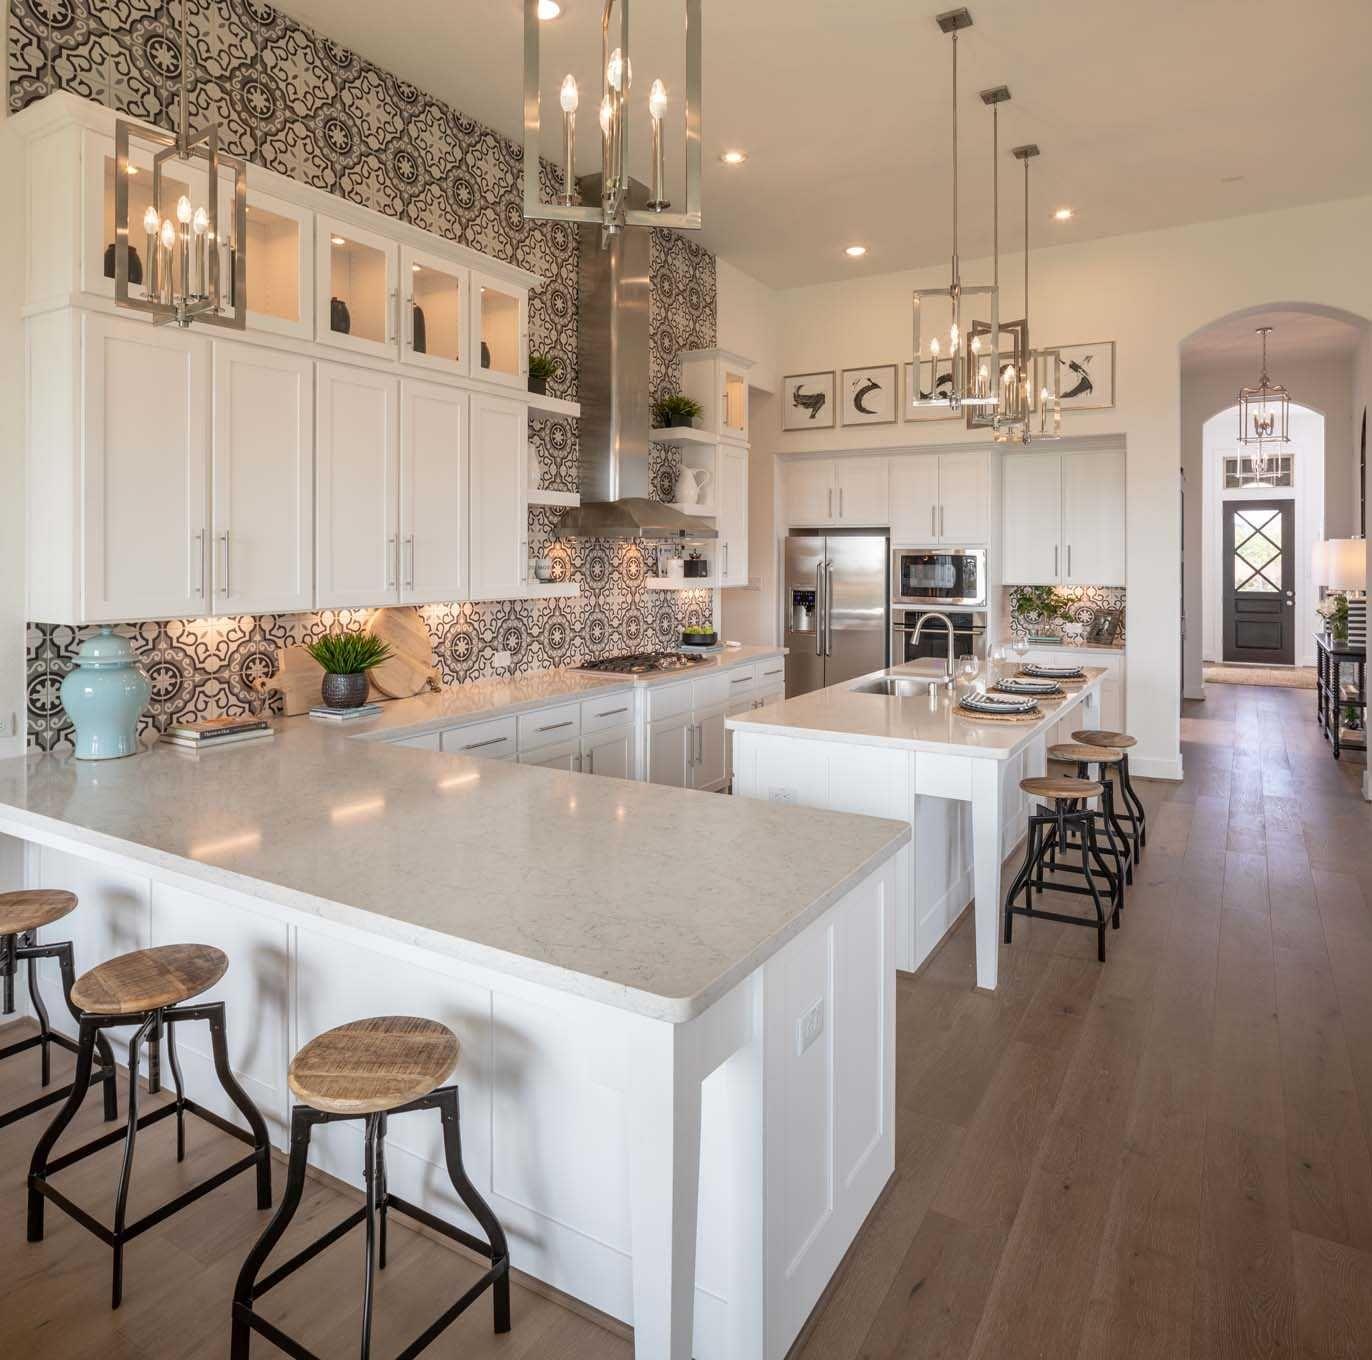 Kitchen in Highland Homes 200 Plan at 2703 Coastal Trail